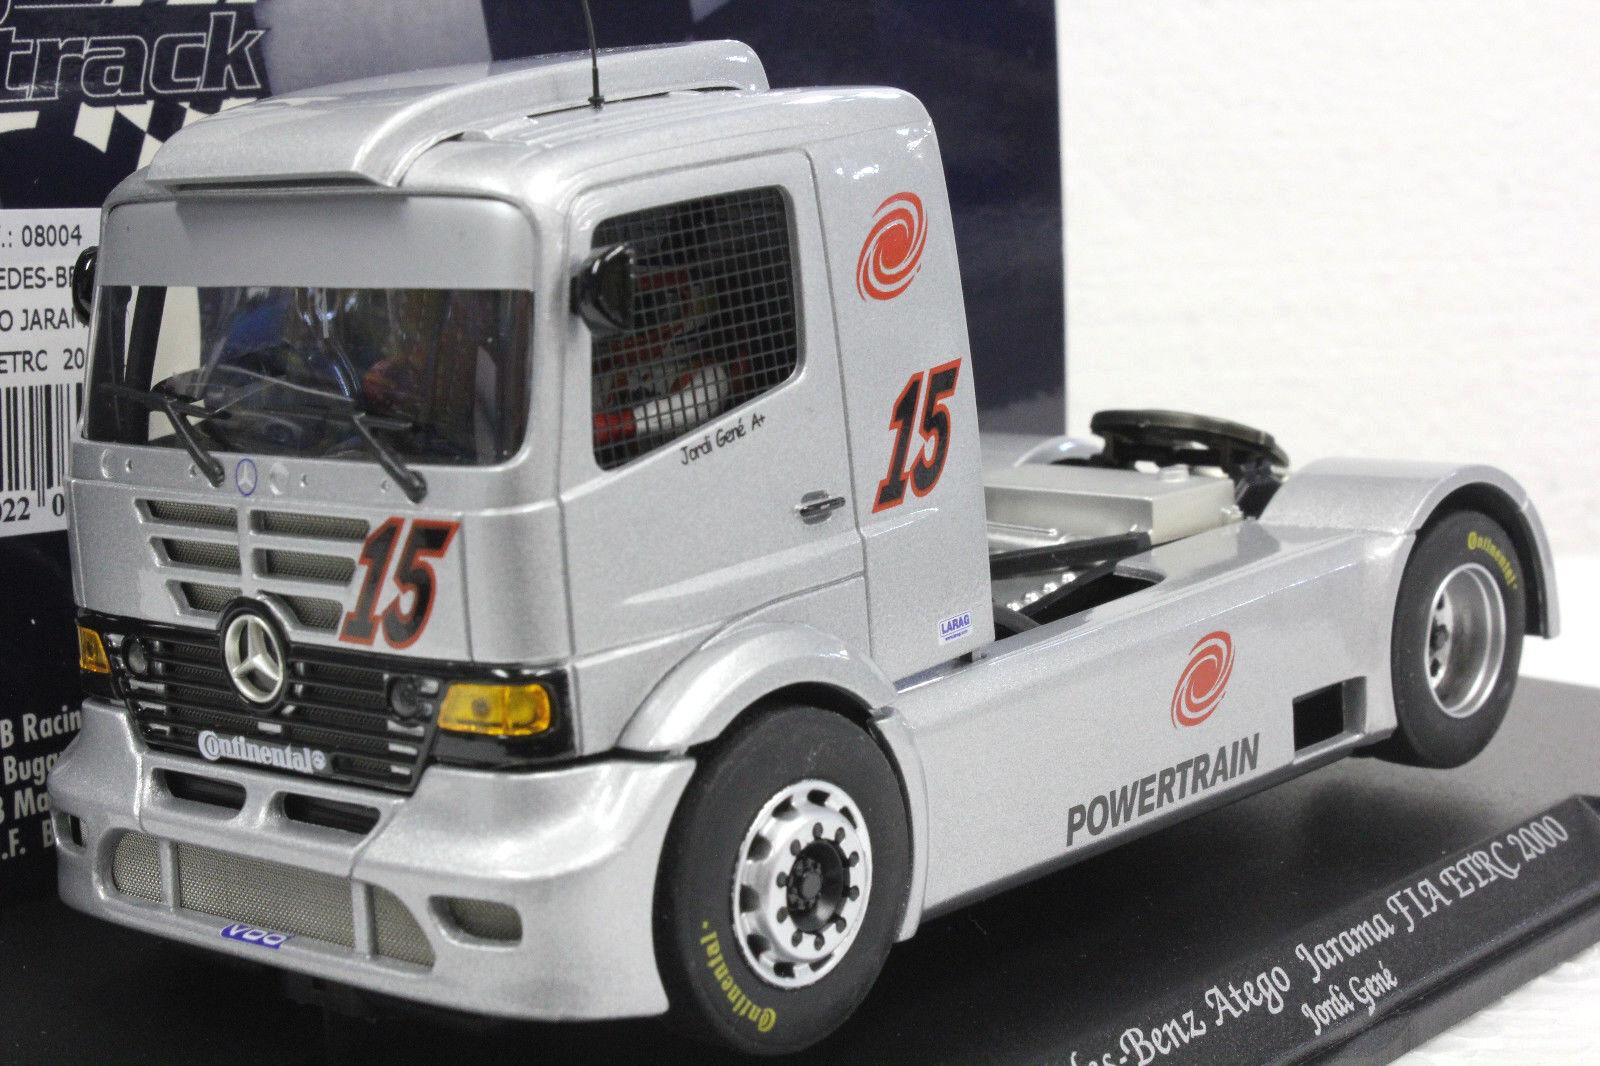 Fly 08004 camión 27 Mercedes Benz Atego Camión FIA ETRC nuevo 1 32 ranura de coche con pantalla